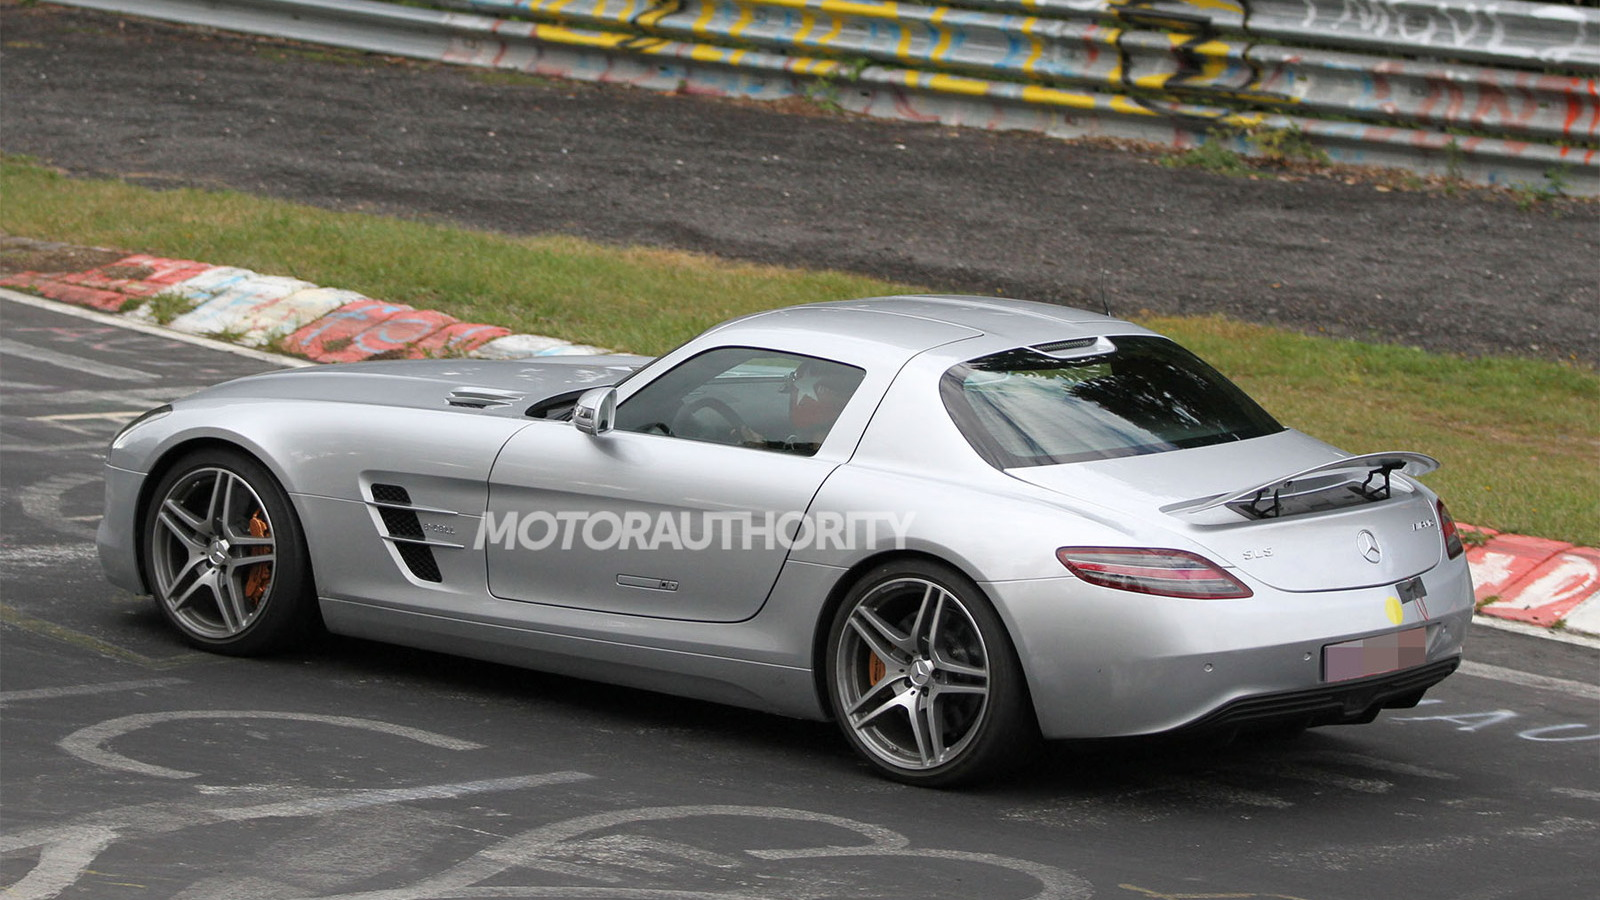 2014 Mercedes-Benz SLS AMG E-Cell spy shots